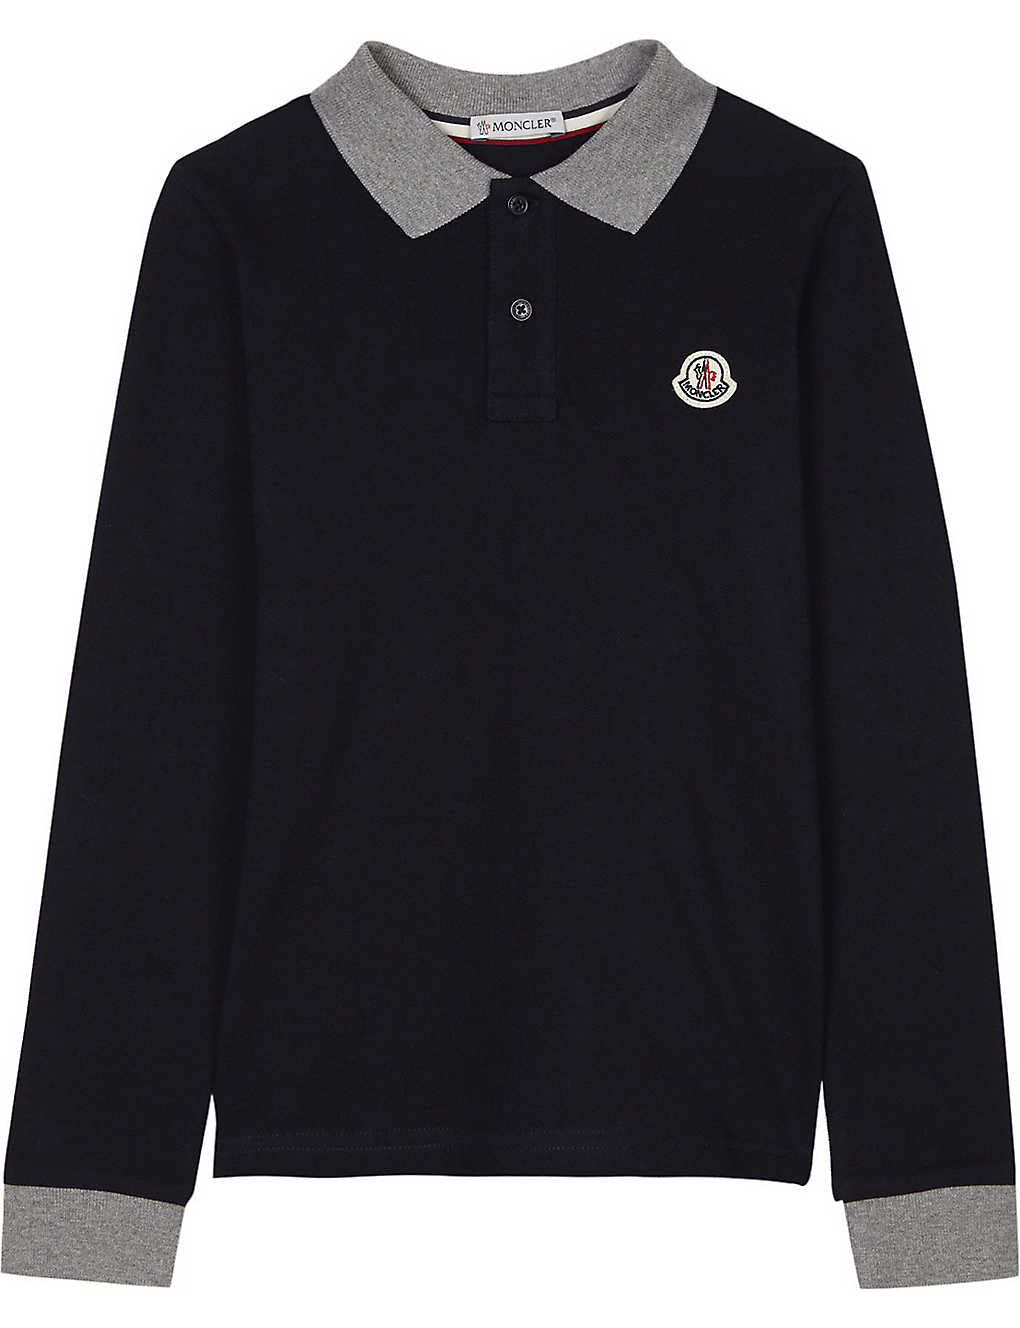 b235041b2 MONCLER - Long-sleeved cotton polo shirt 4-14 years | Selfridges.com